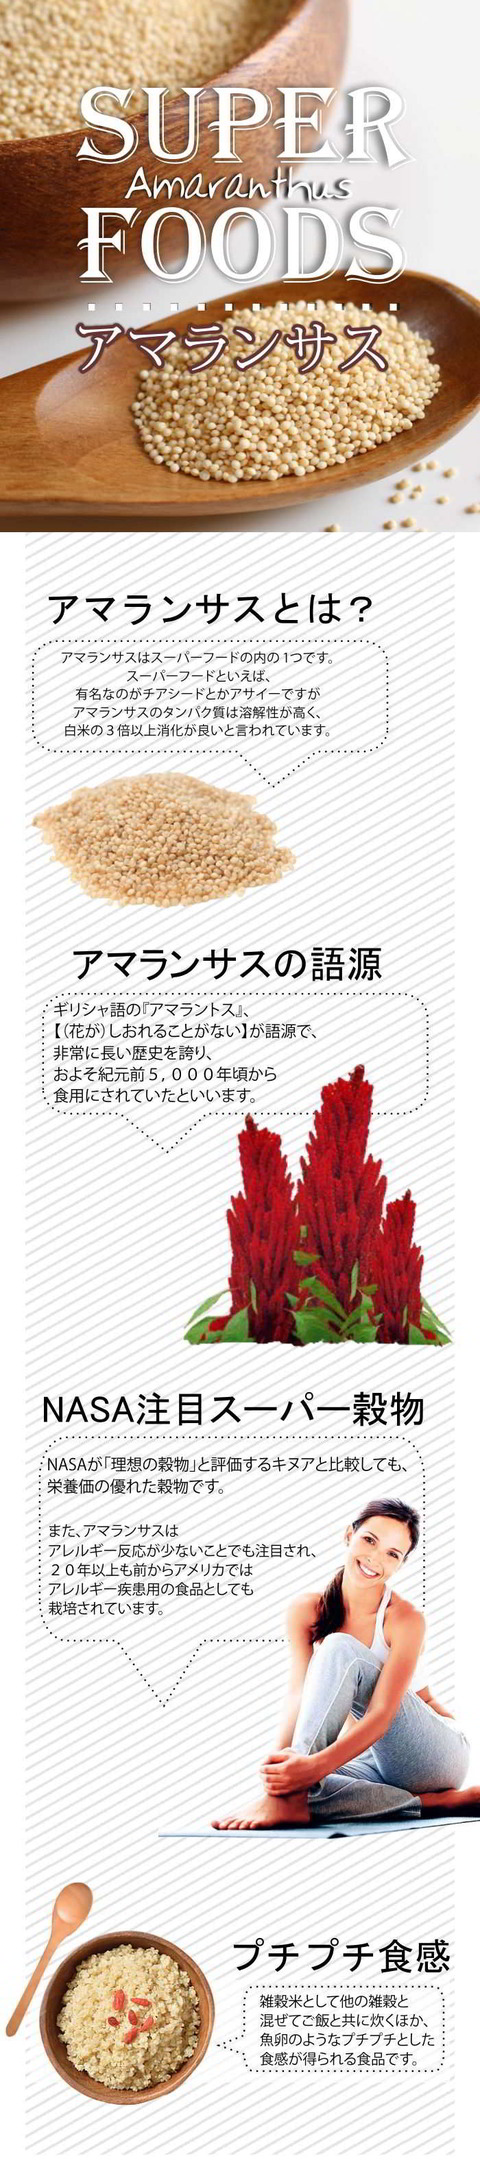 amaranto-jp-01